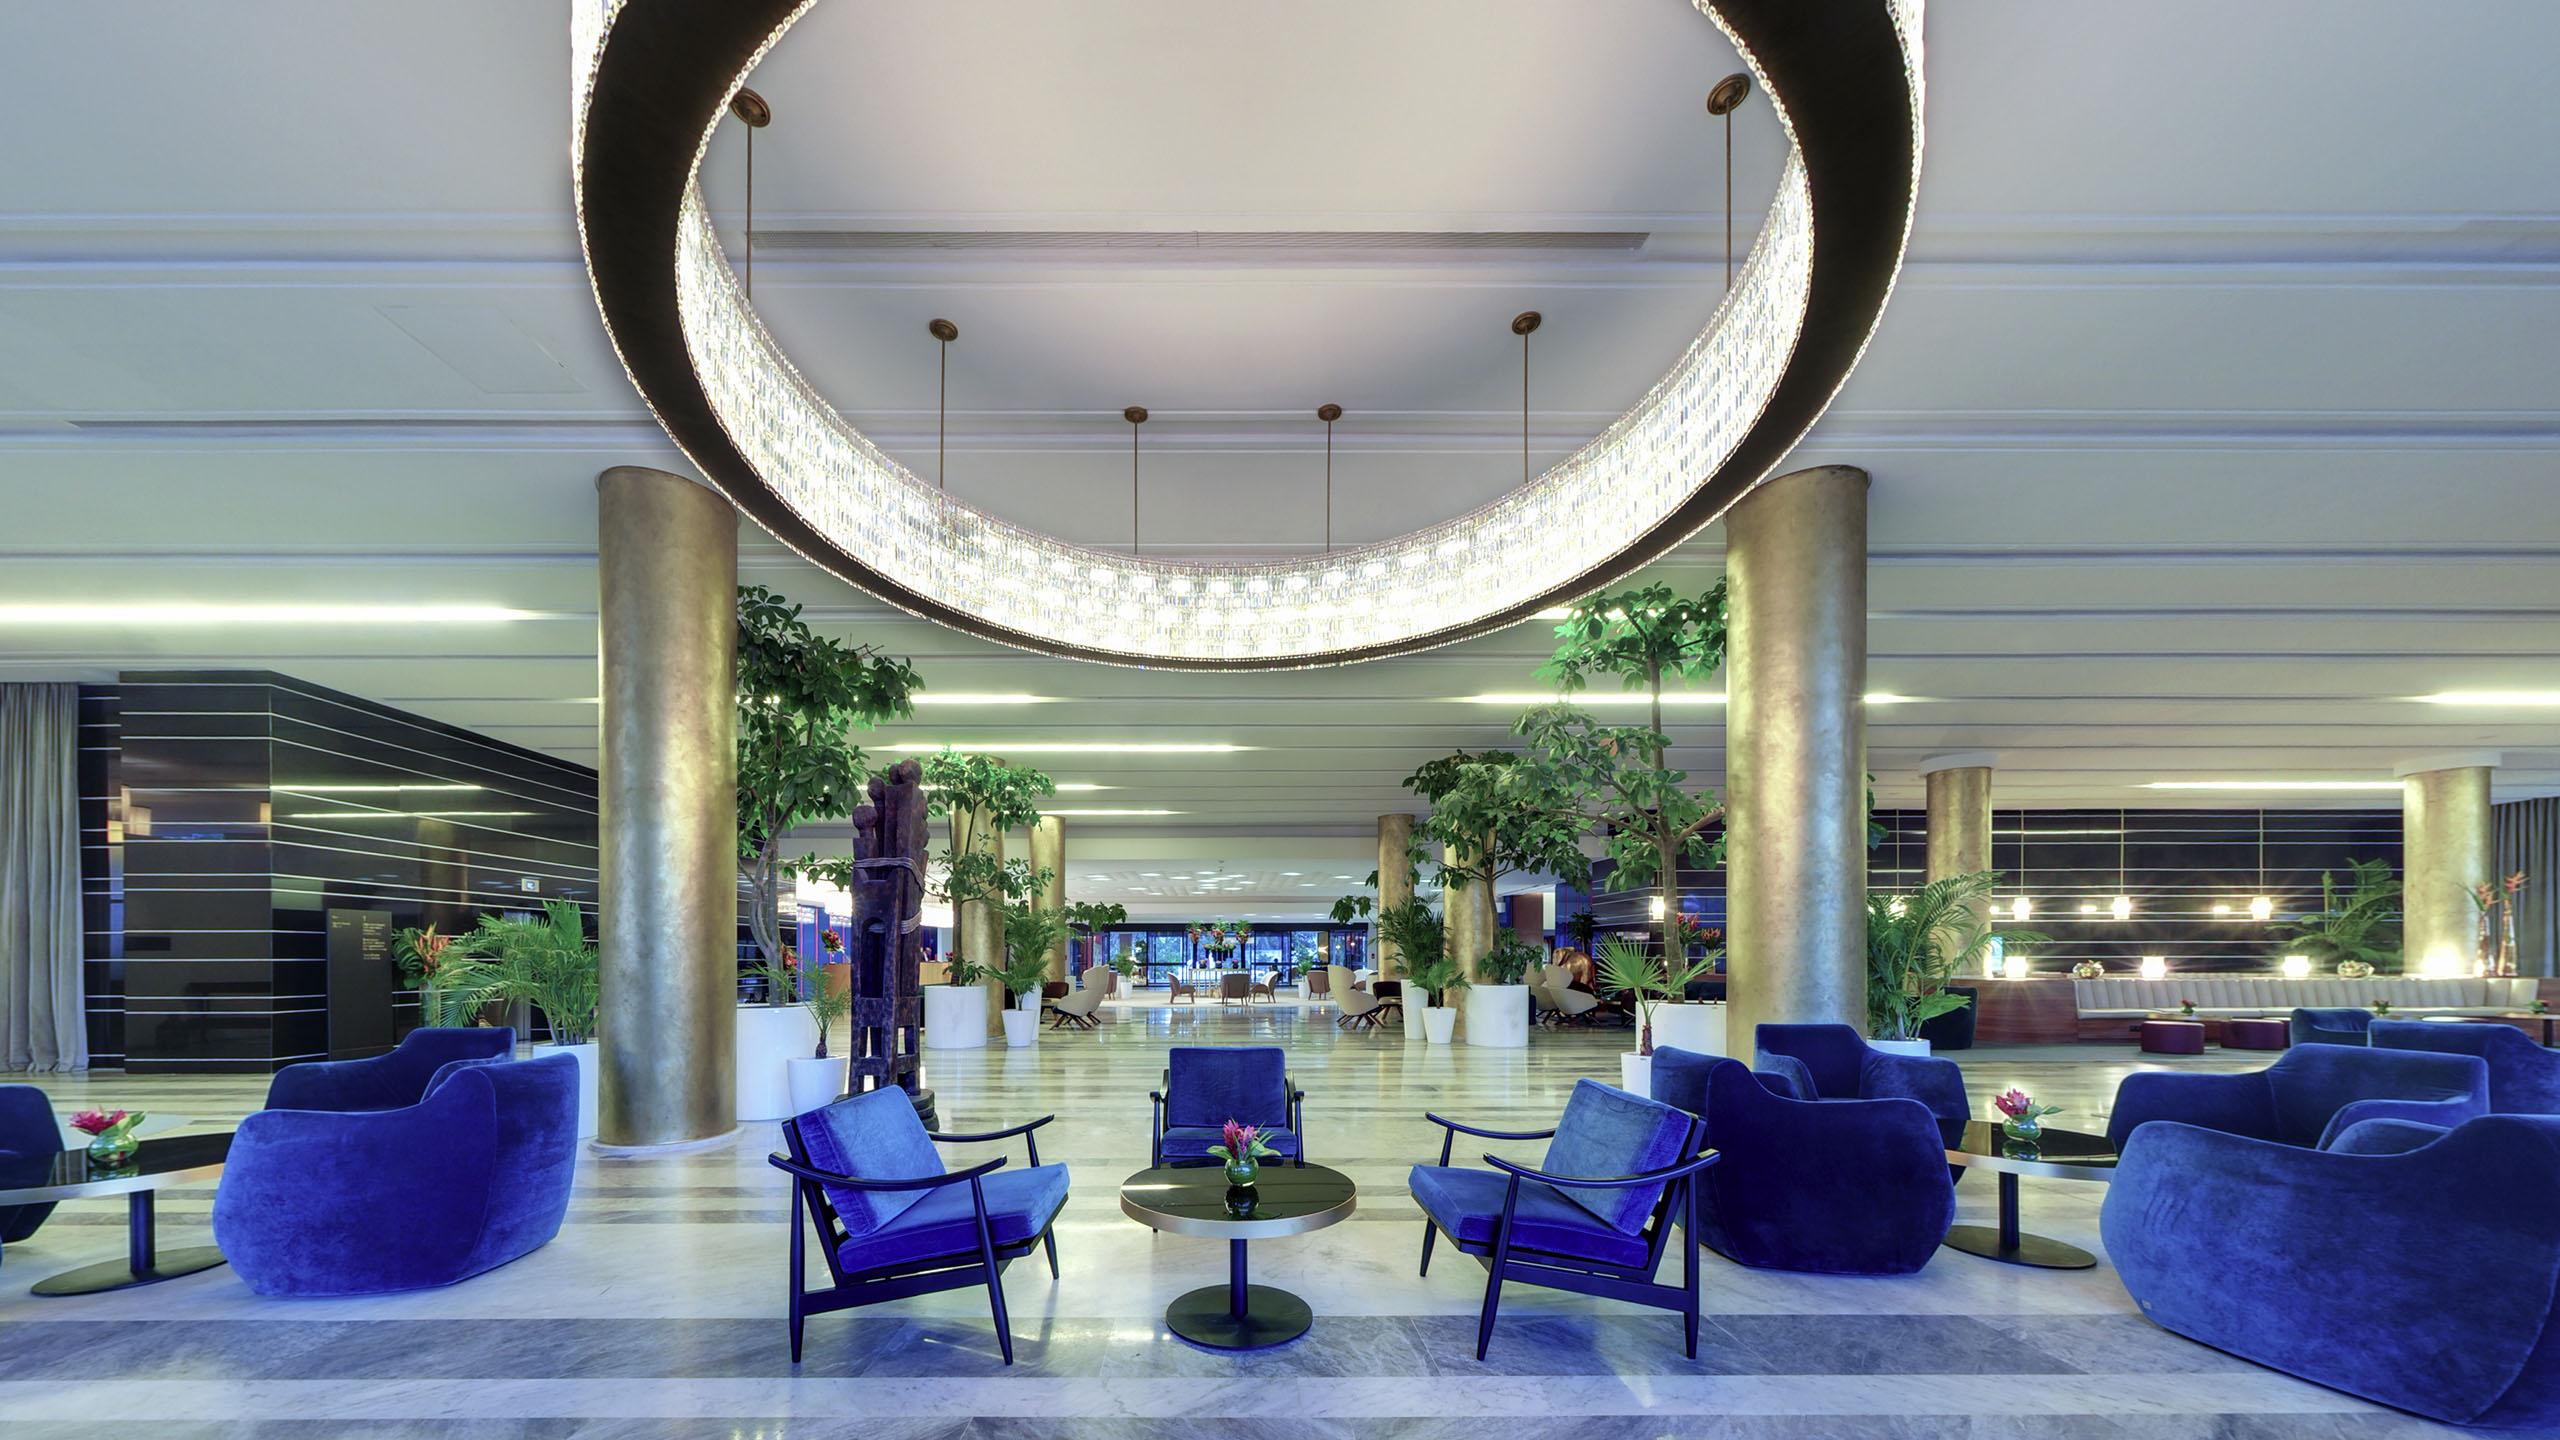 Hotel de luxe abidjan u sofitel abidjan hôtel ivoire